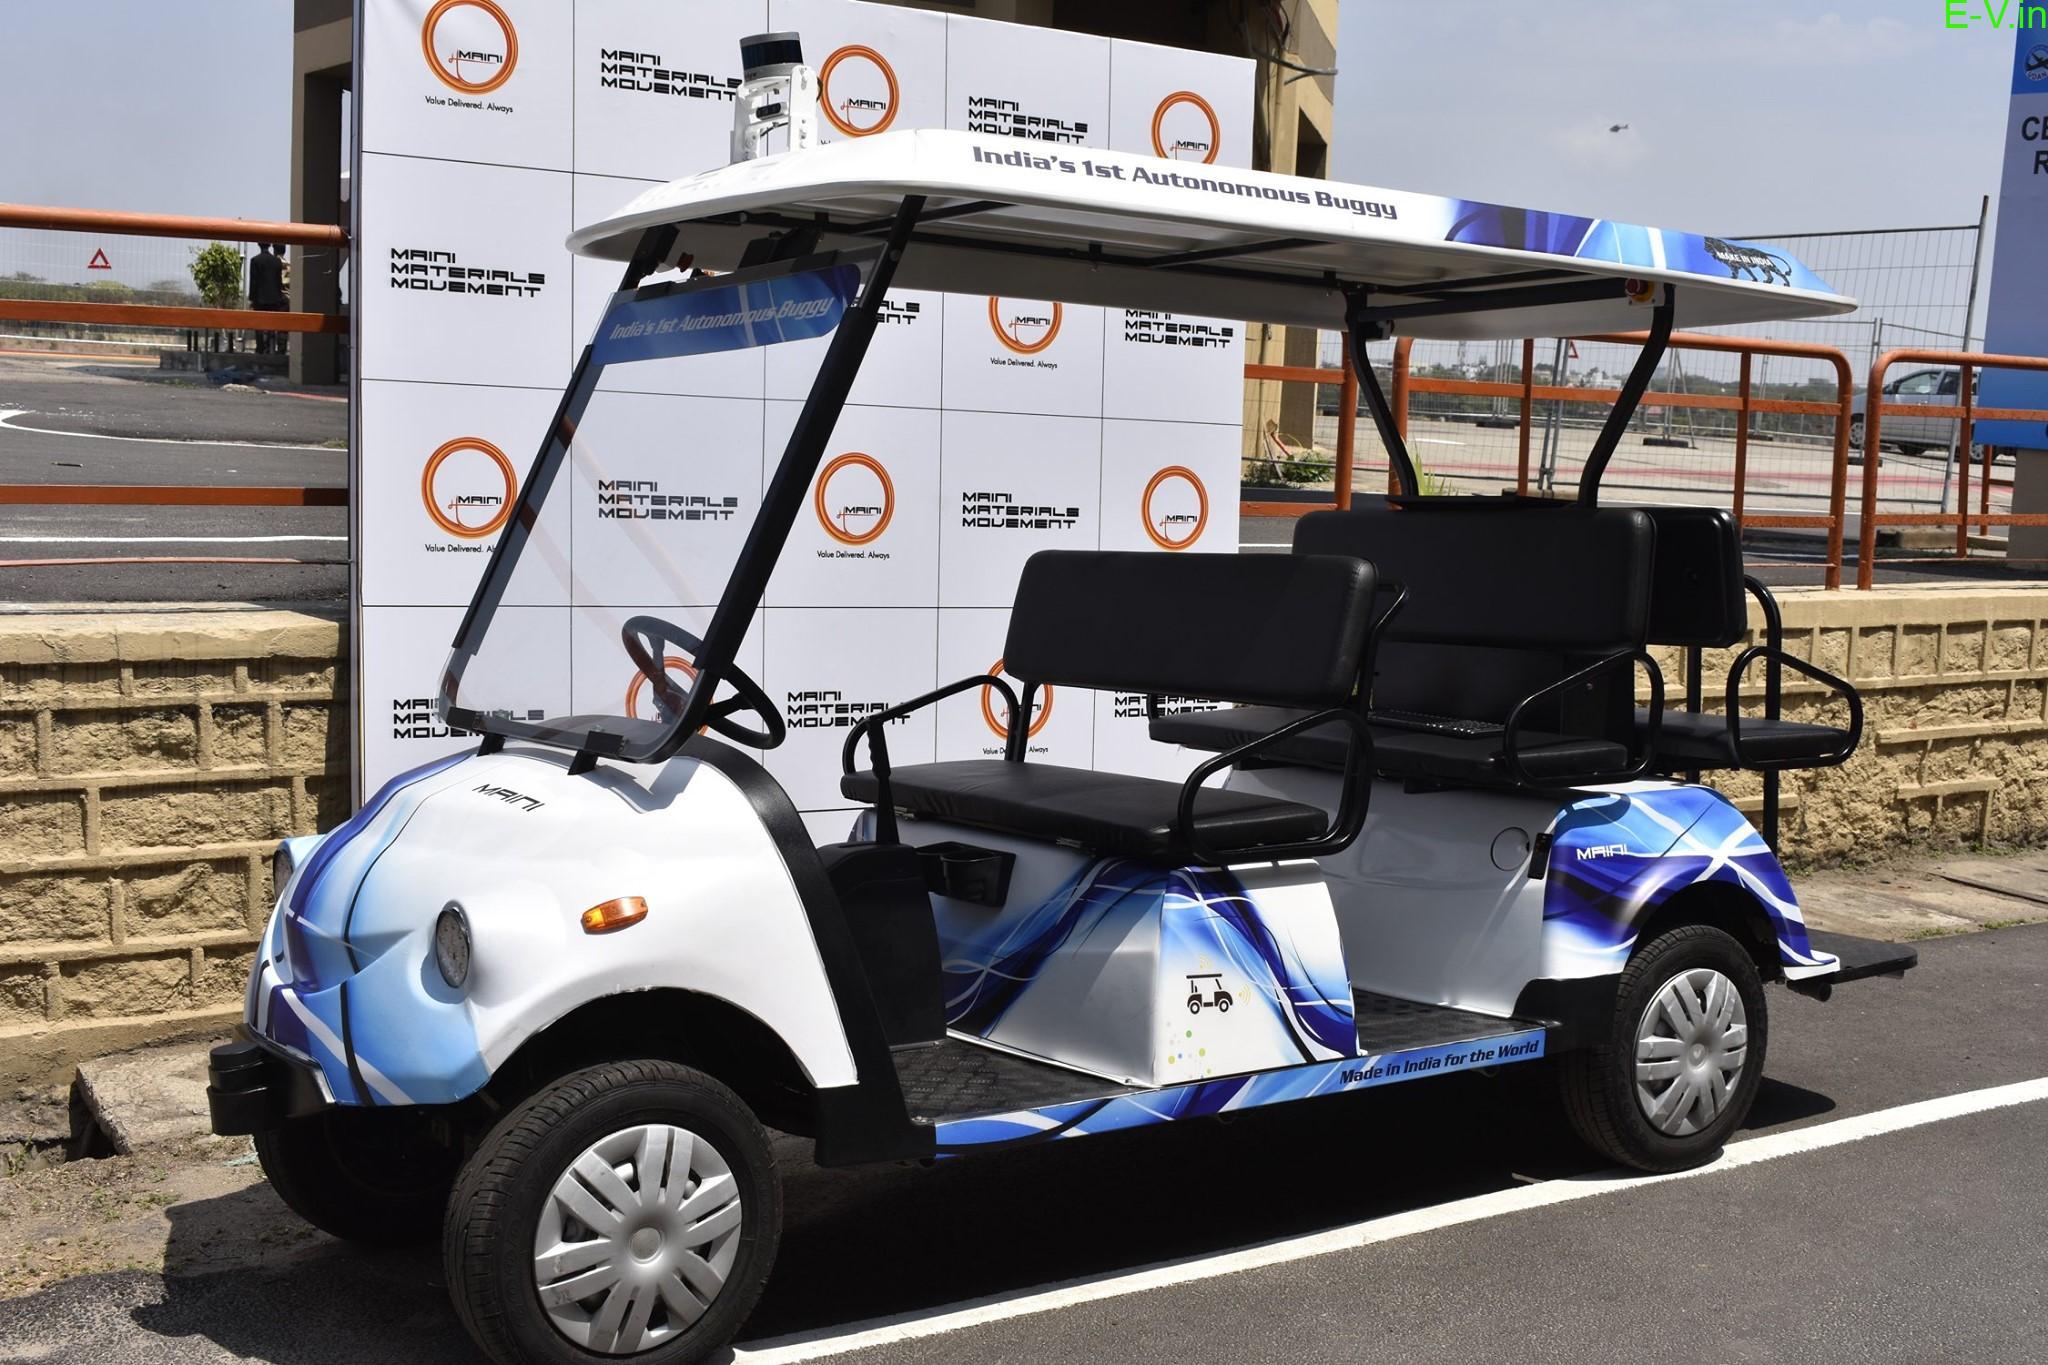 India's first autonomous buggy